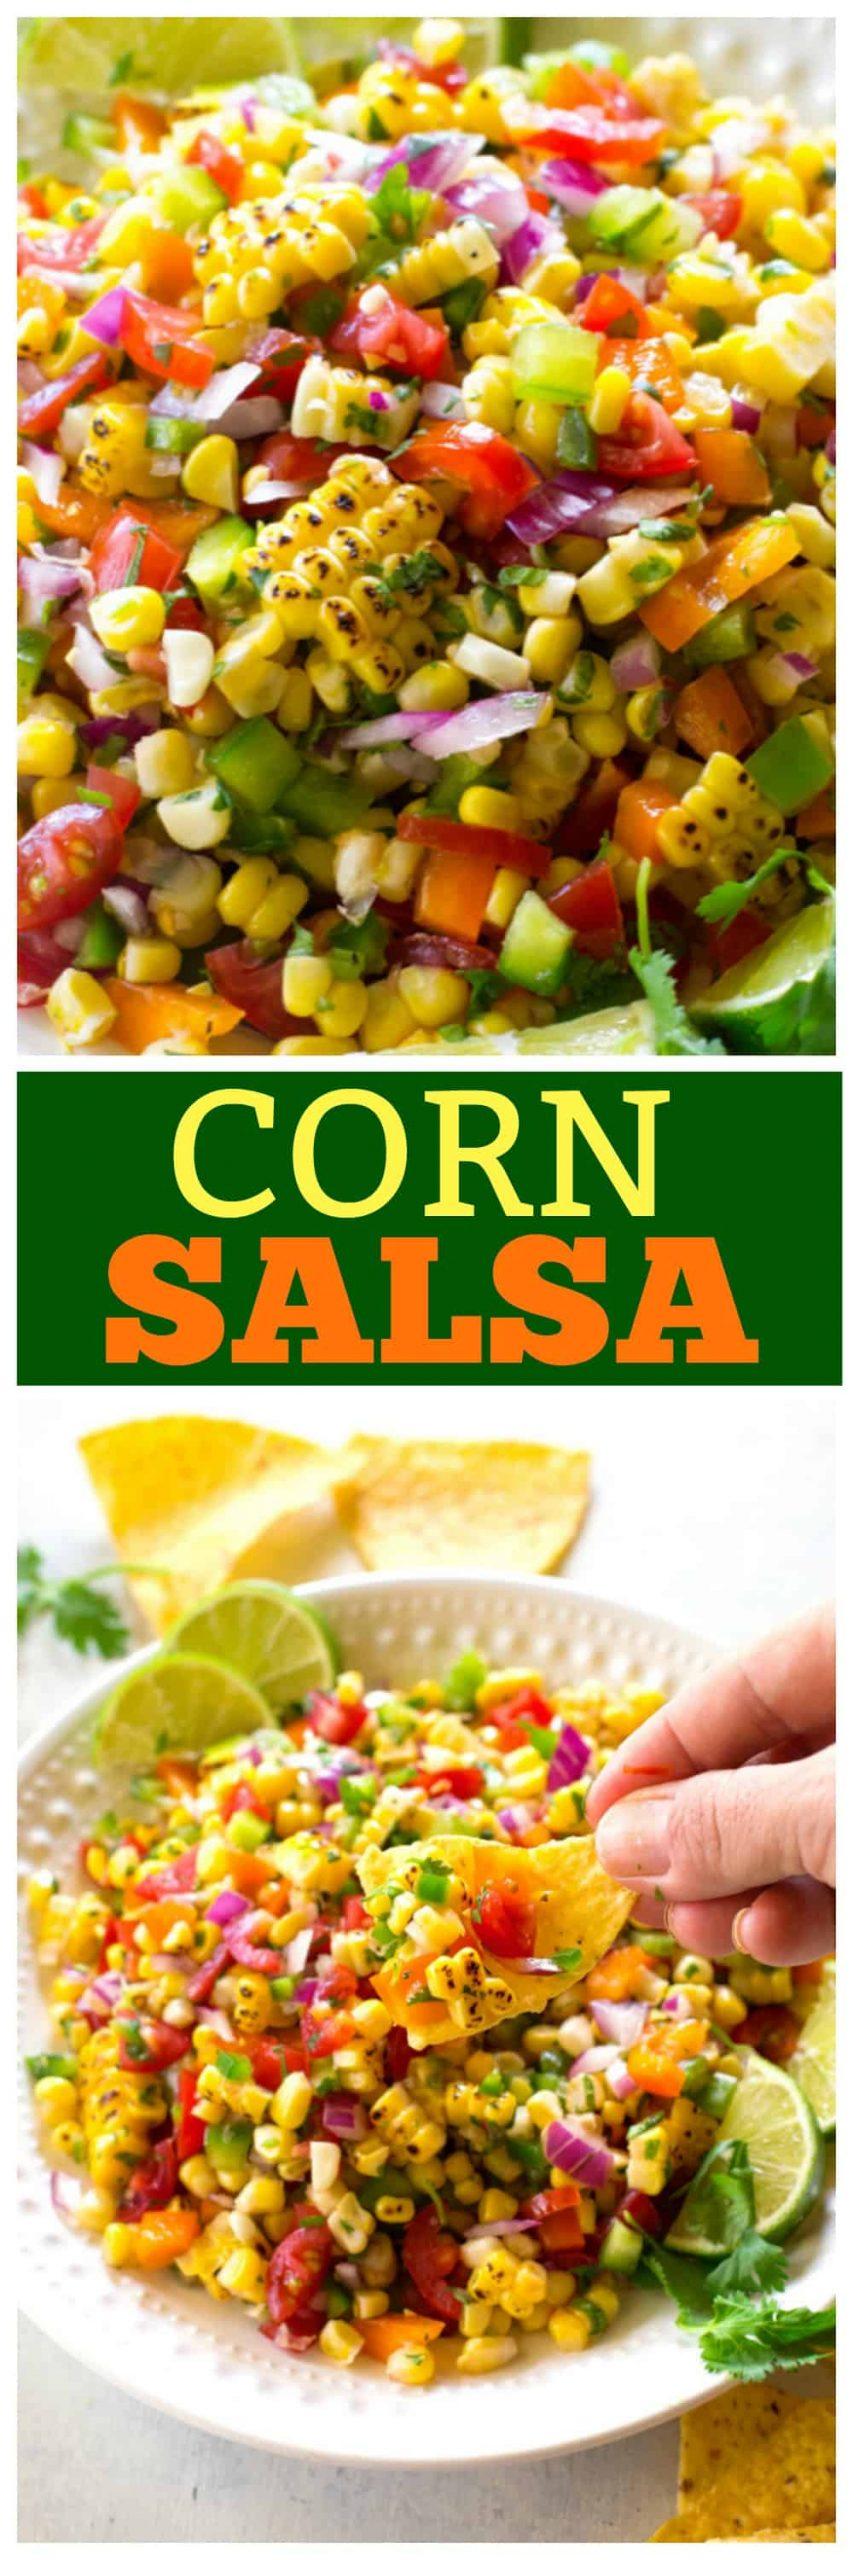 Corn Salsa on a chip